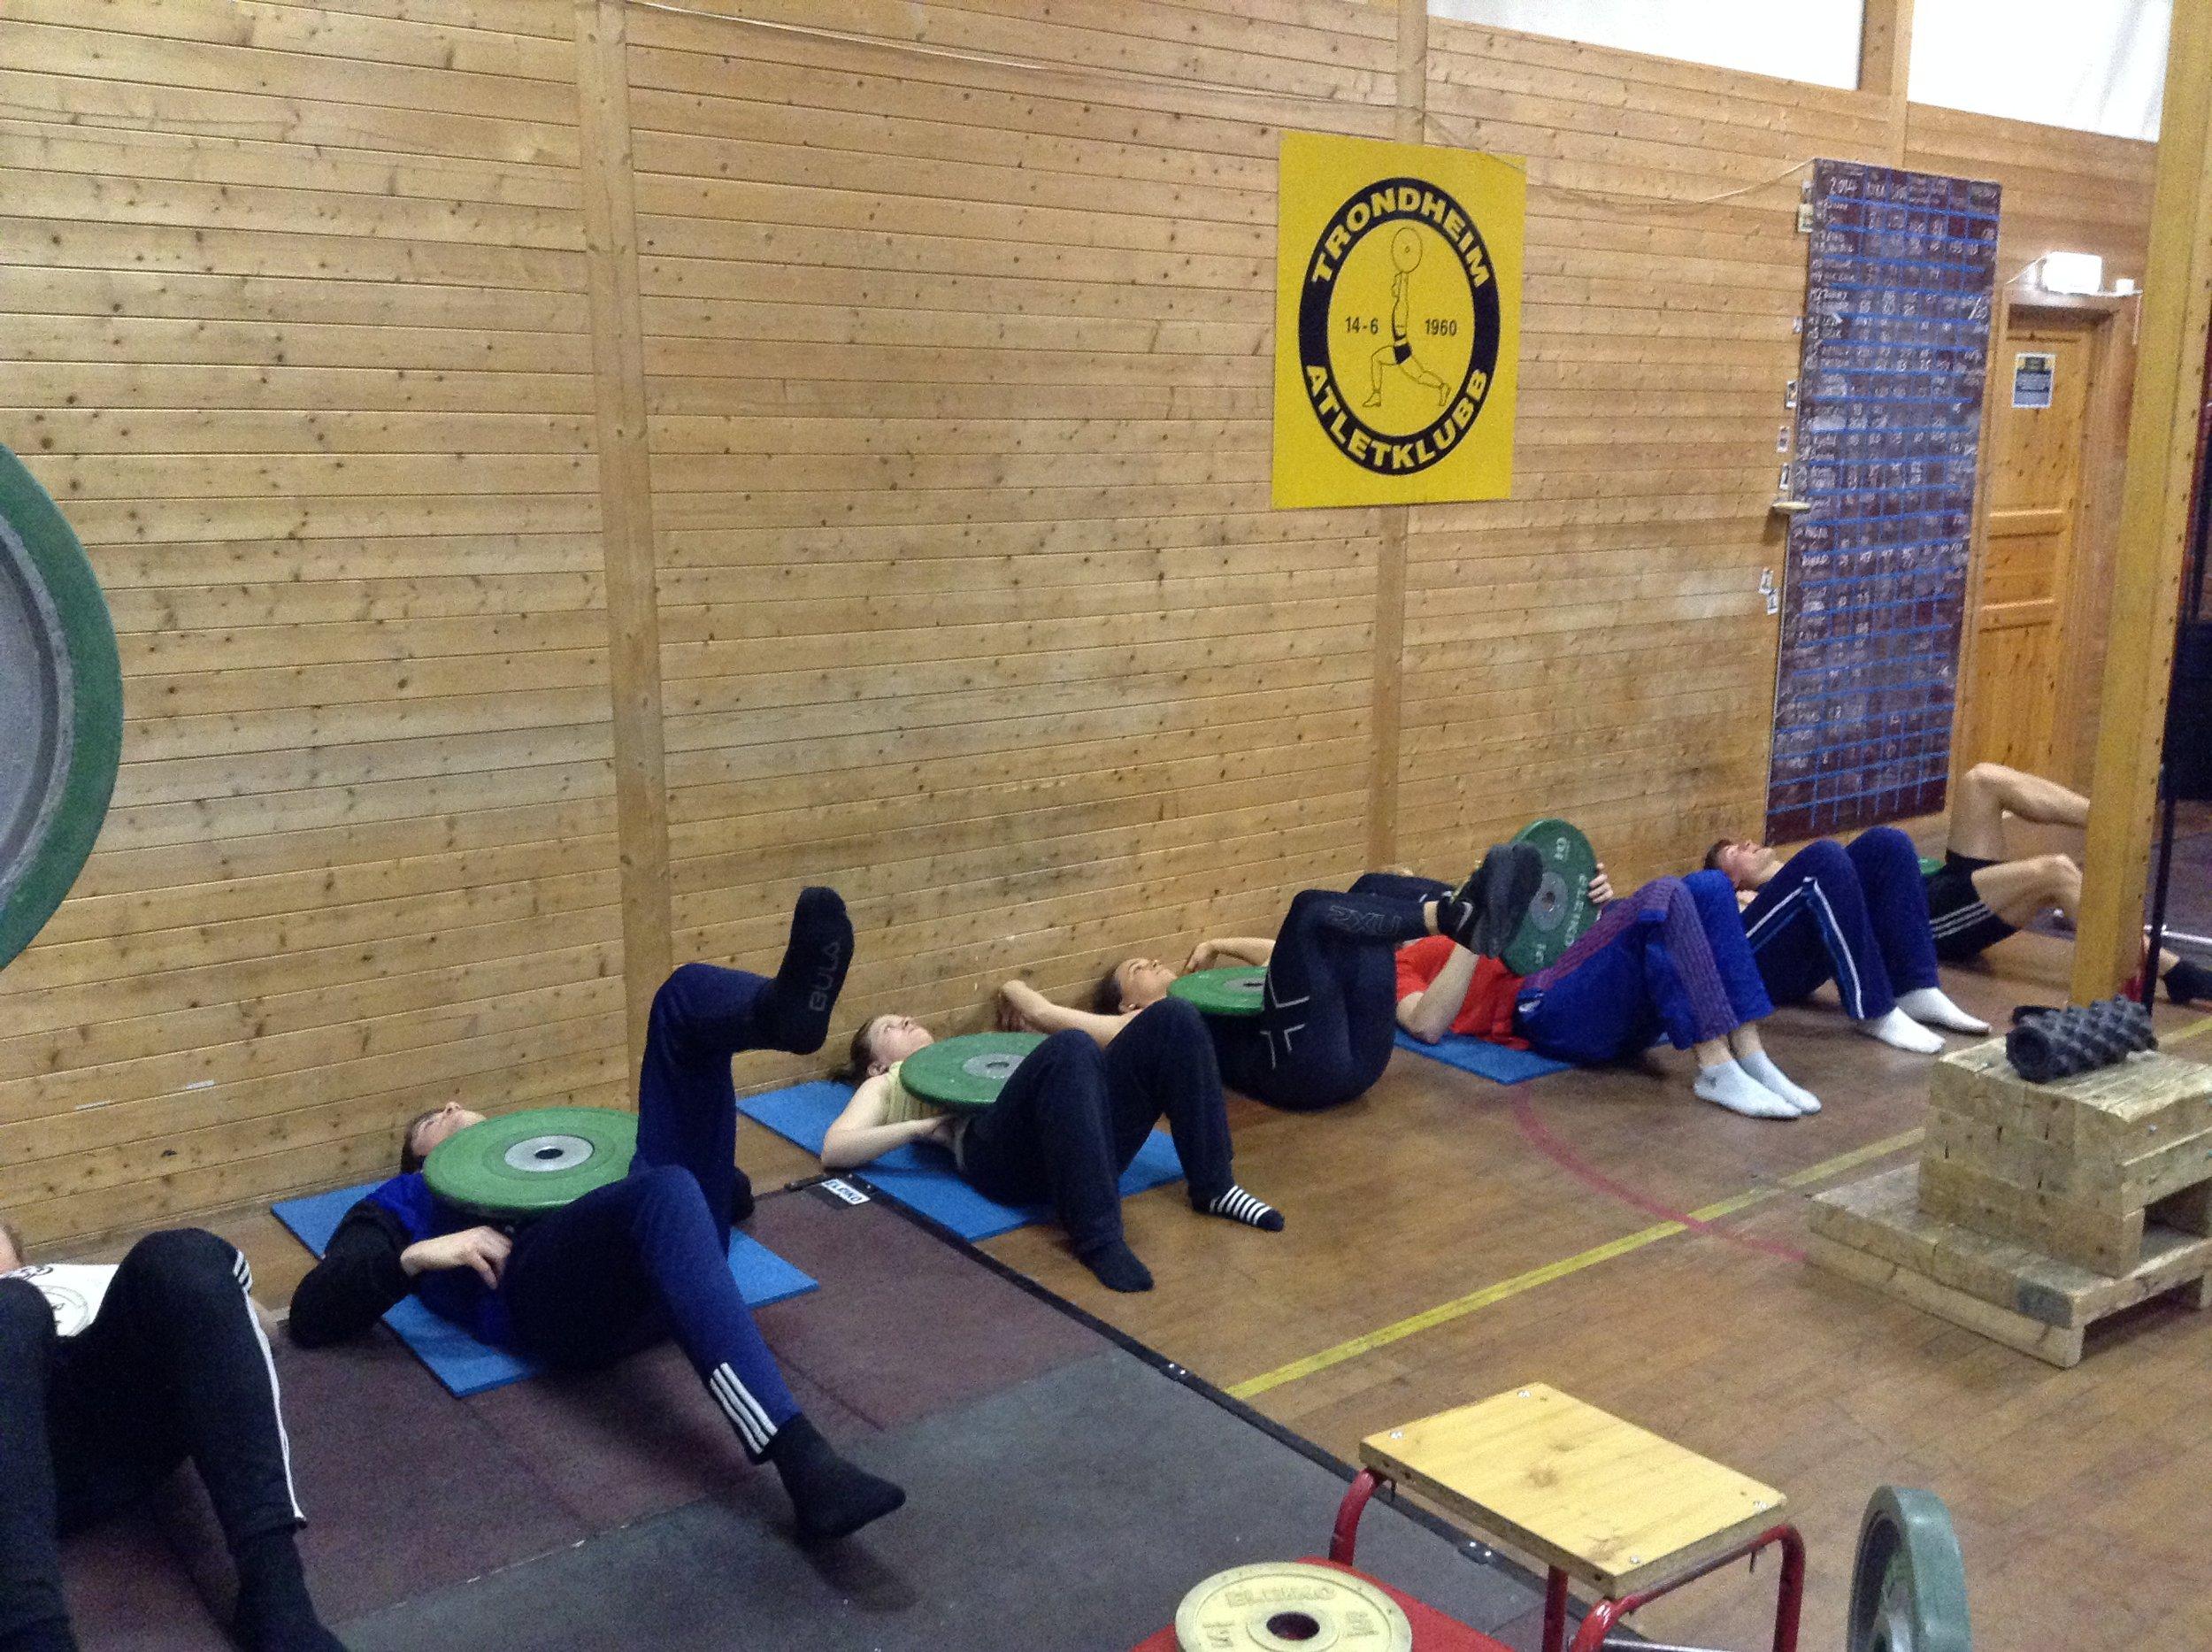 Trondheim Atletklubb